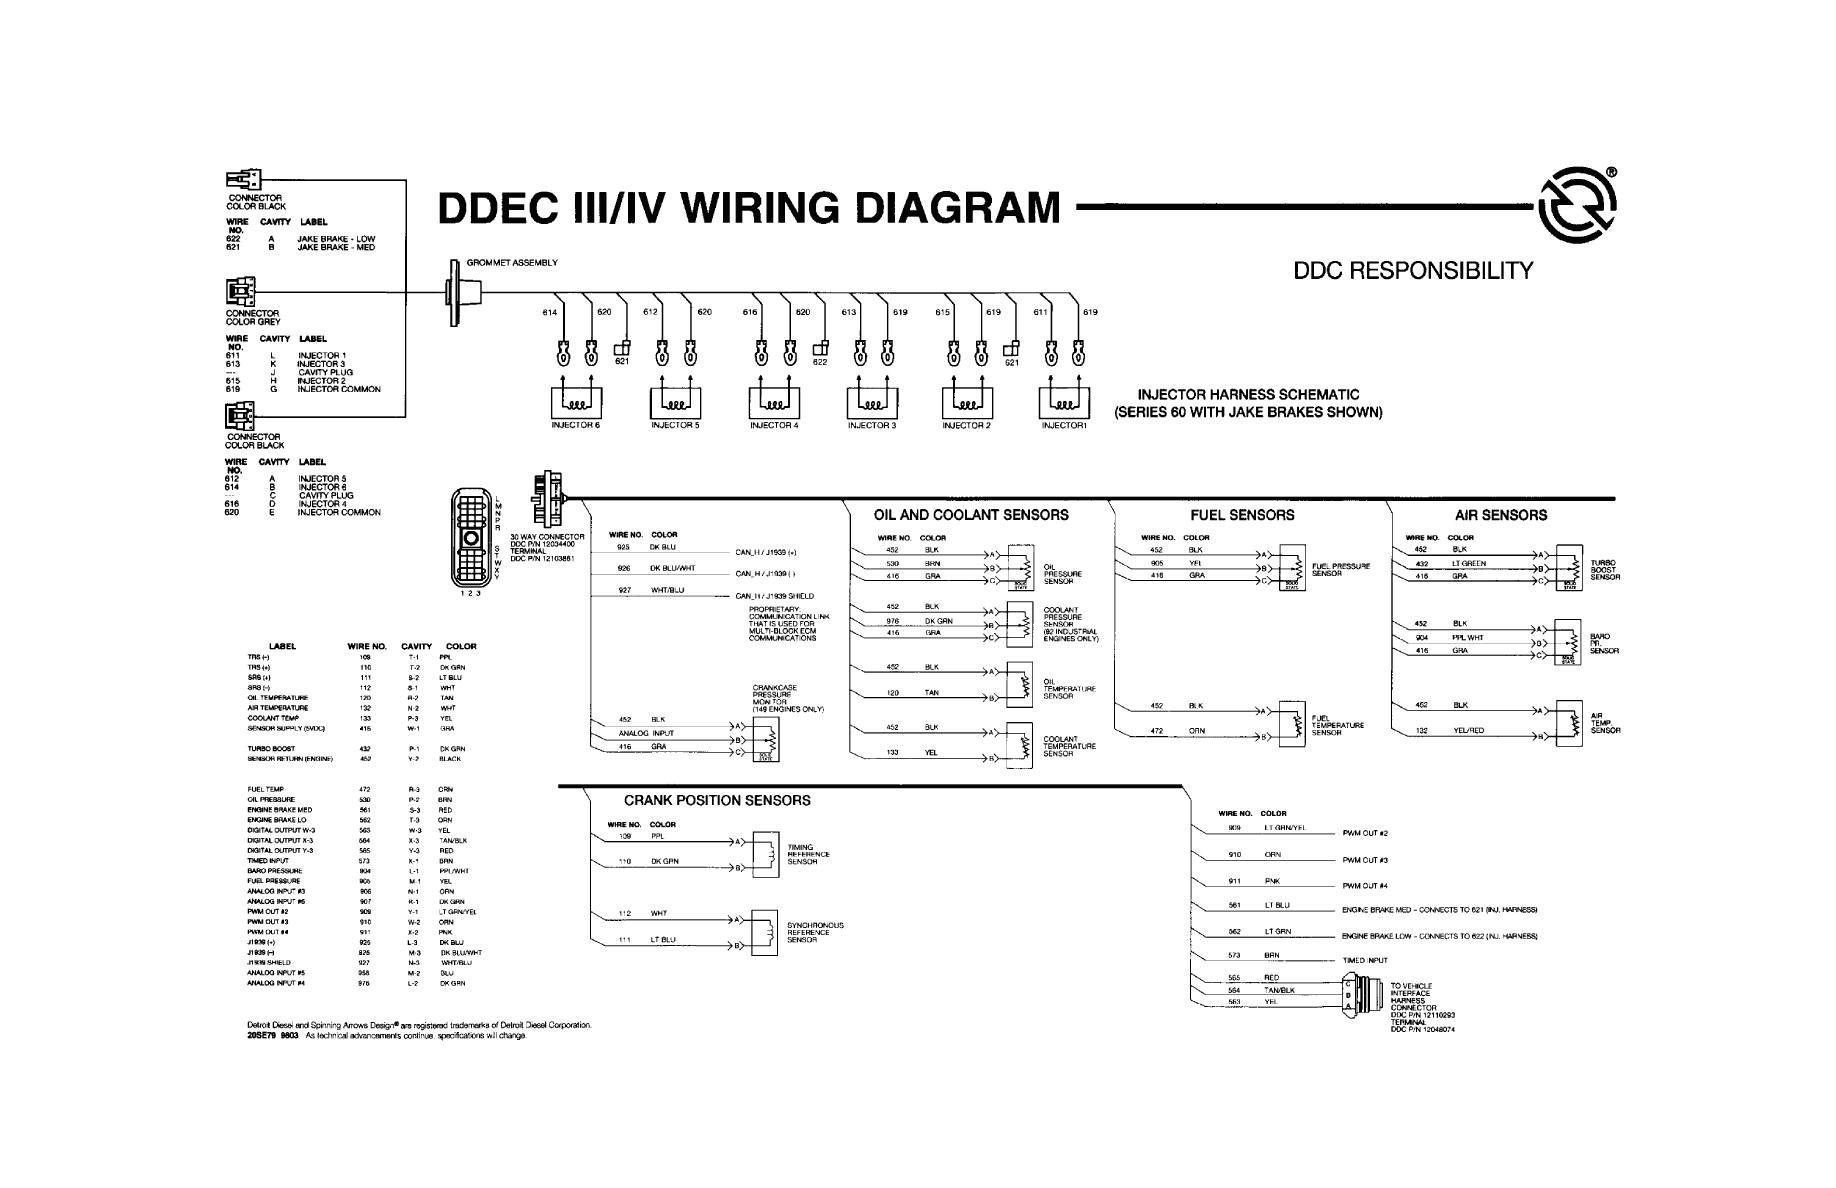 iv 2 wiring diagram h it wiring diagram info ddec iv wiring diagram wiring diagram iv